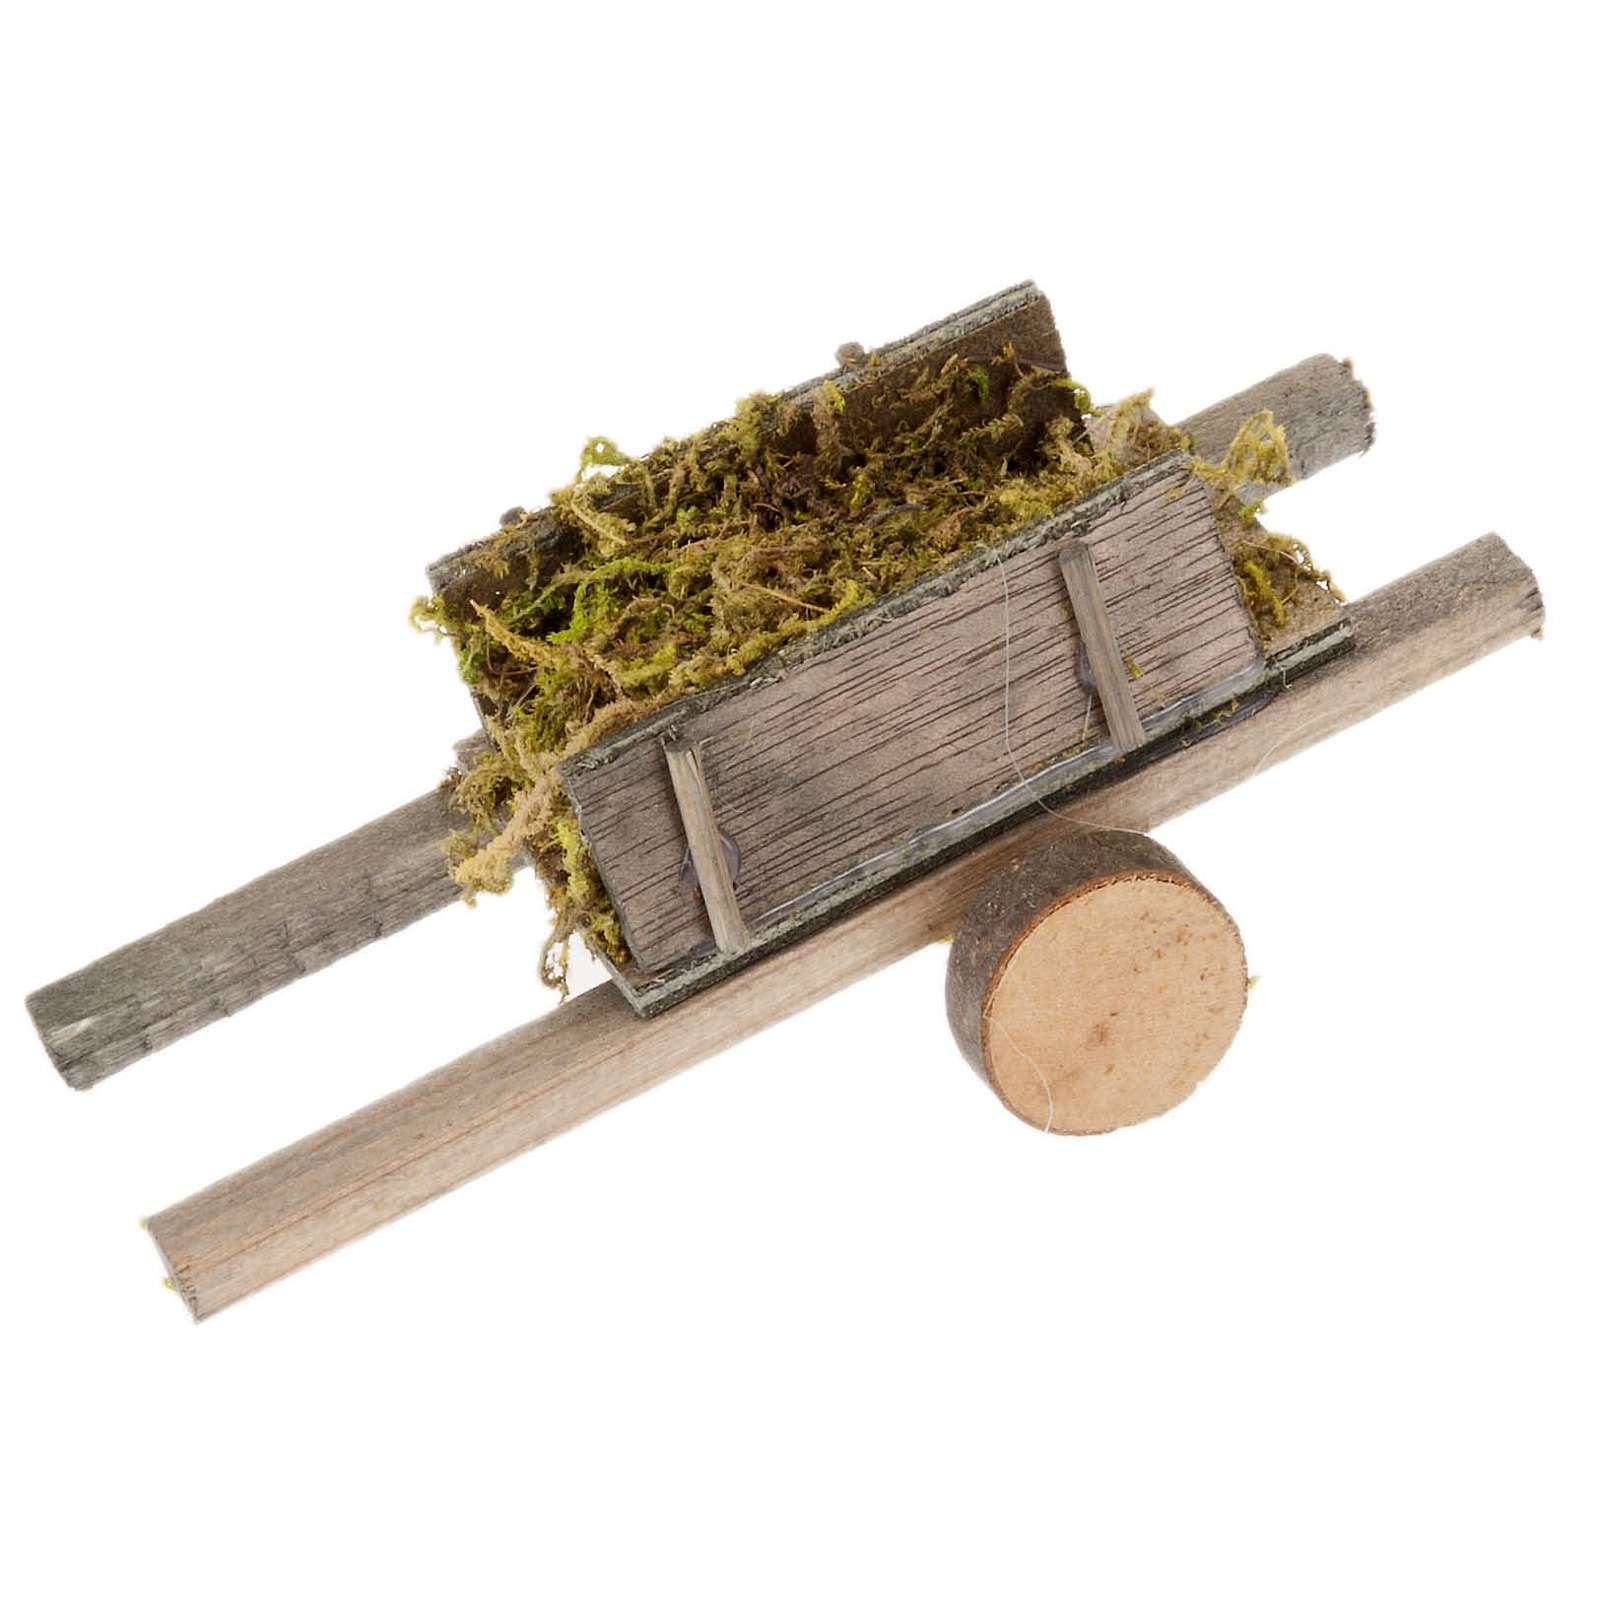 Nativity scene accessory, cart with moss 4